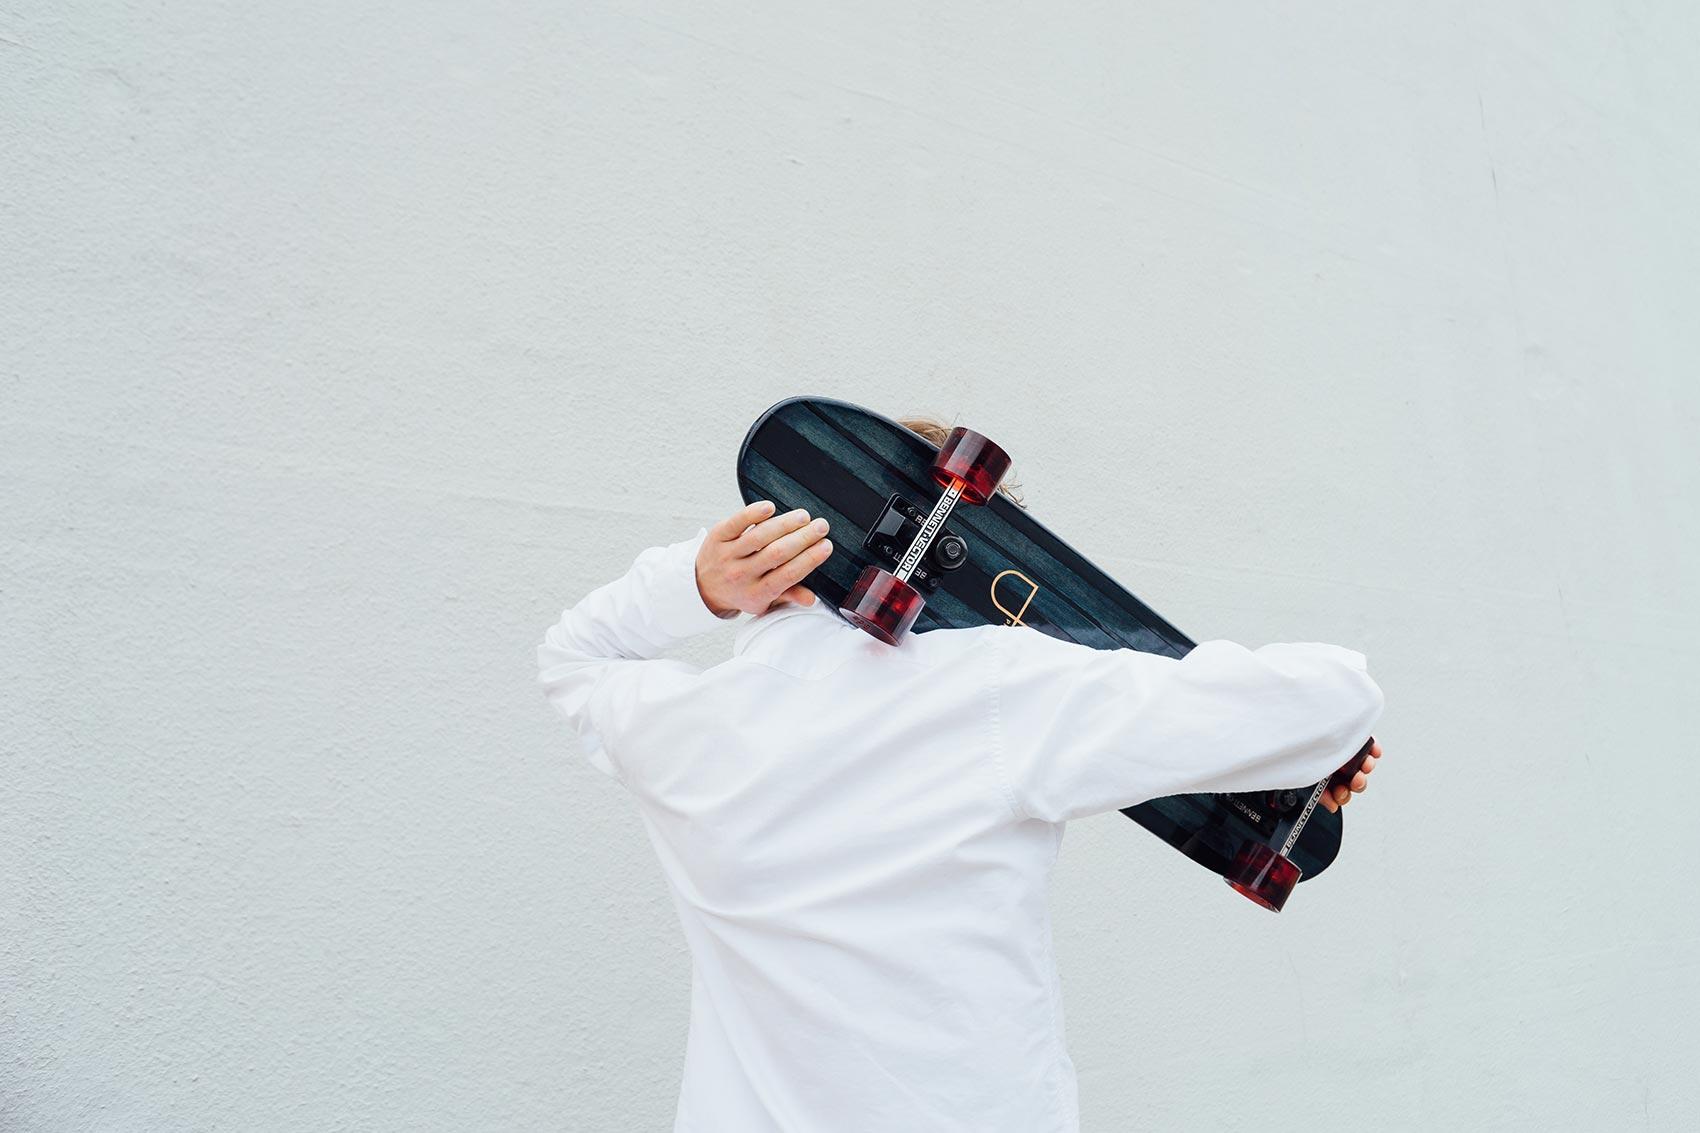 side-project-skateboards-indigo-josh-anderson-3.jpg